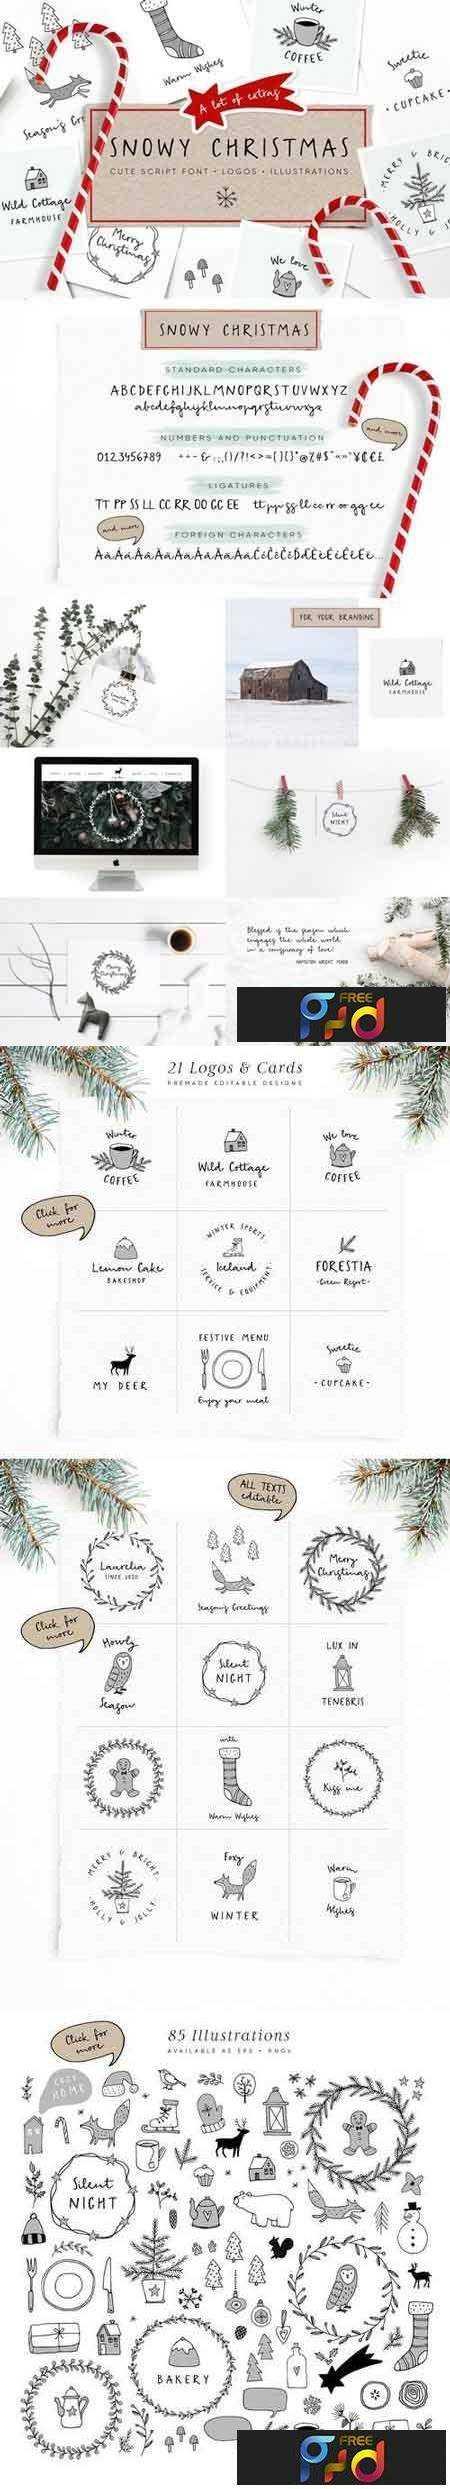 1708024 Snowy Christmas script font & logos 1840191 - FreePSDvn